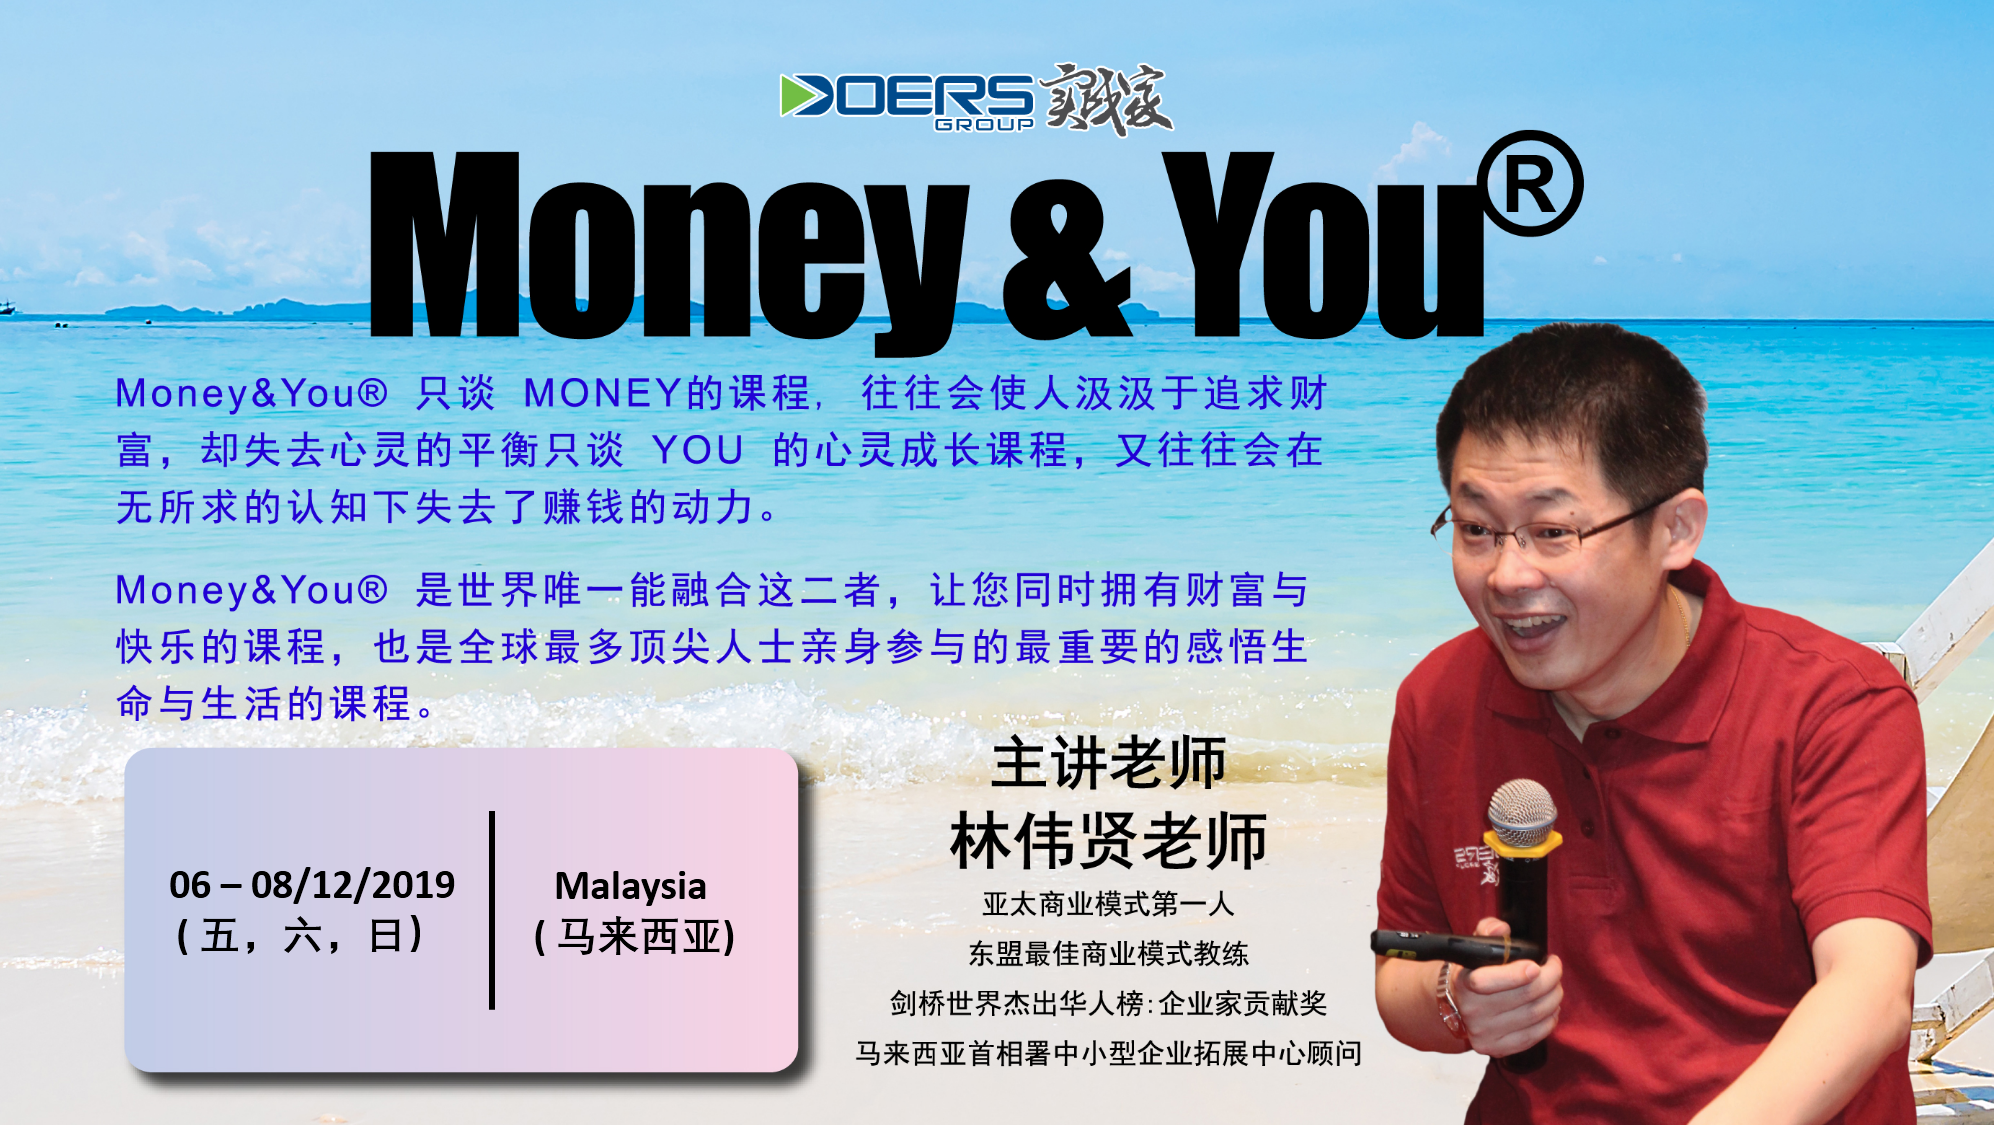 Doers Money&You® Malaysia